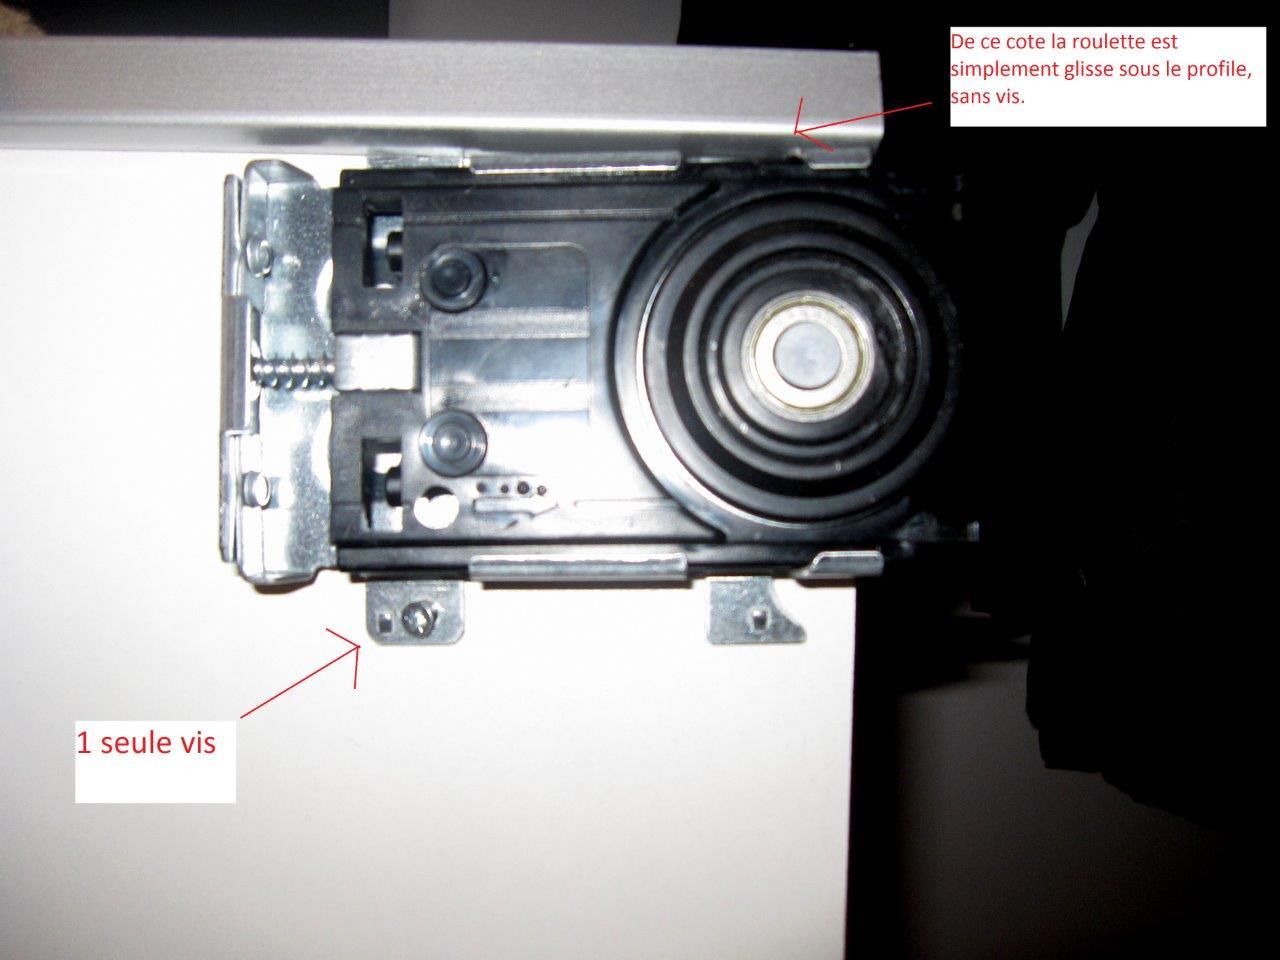 IMG_4412_modified2.jpg IMG_4401_modified2.jpg IMG_4405_modified2.jpg